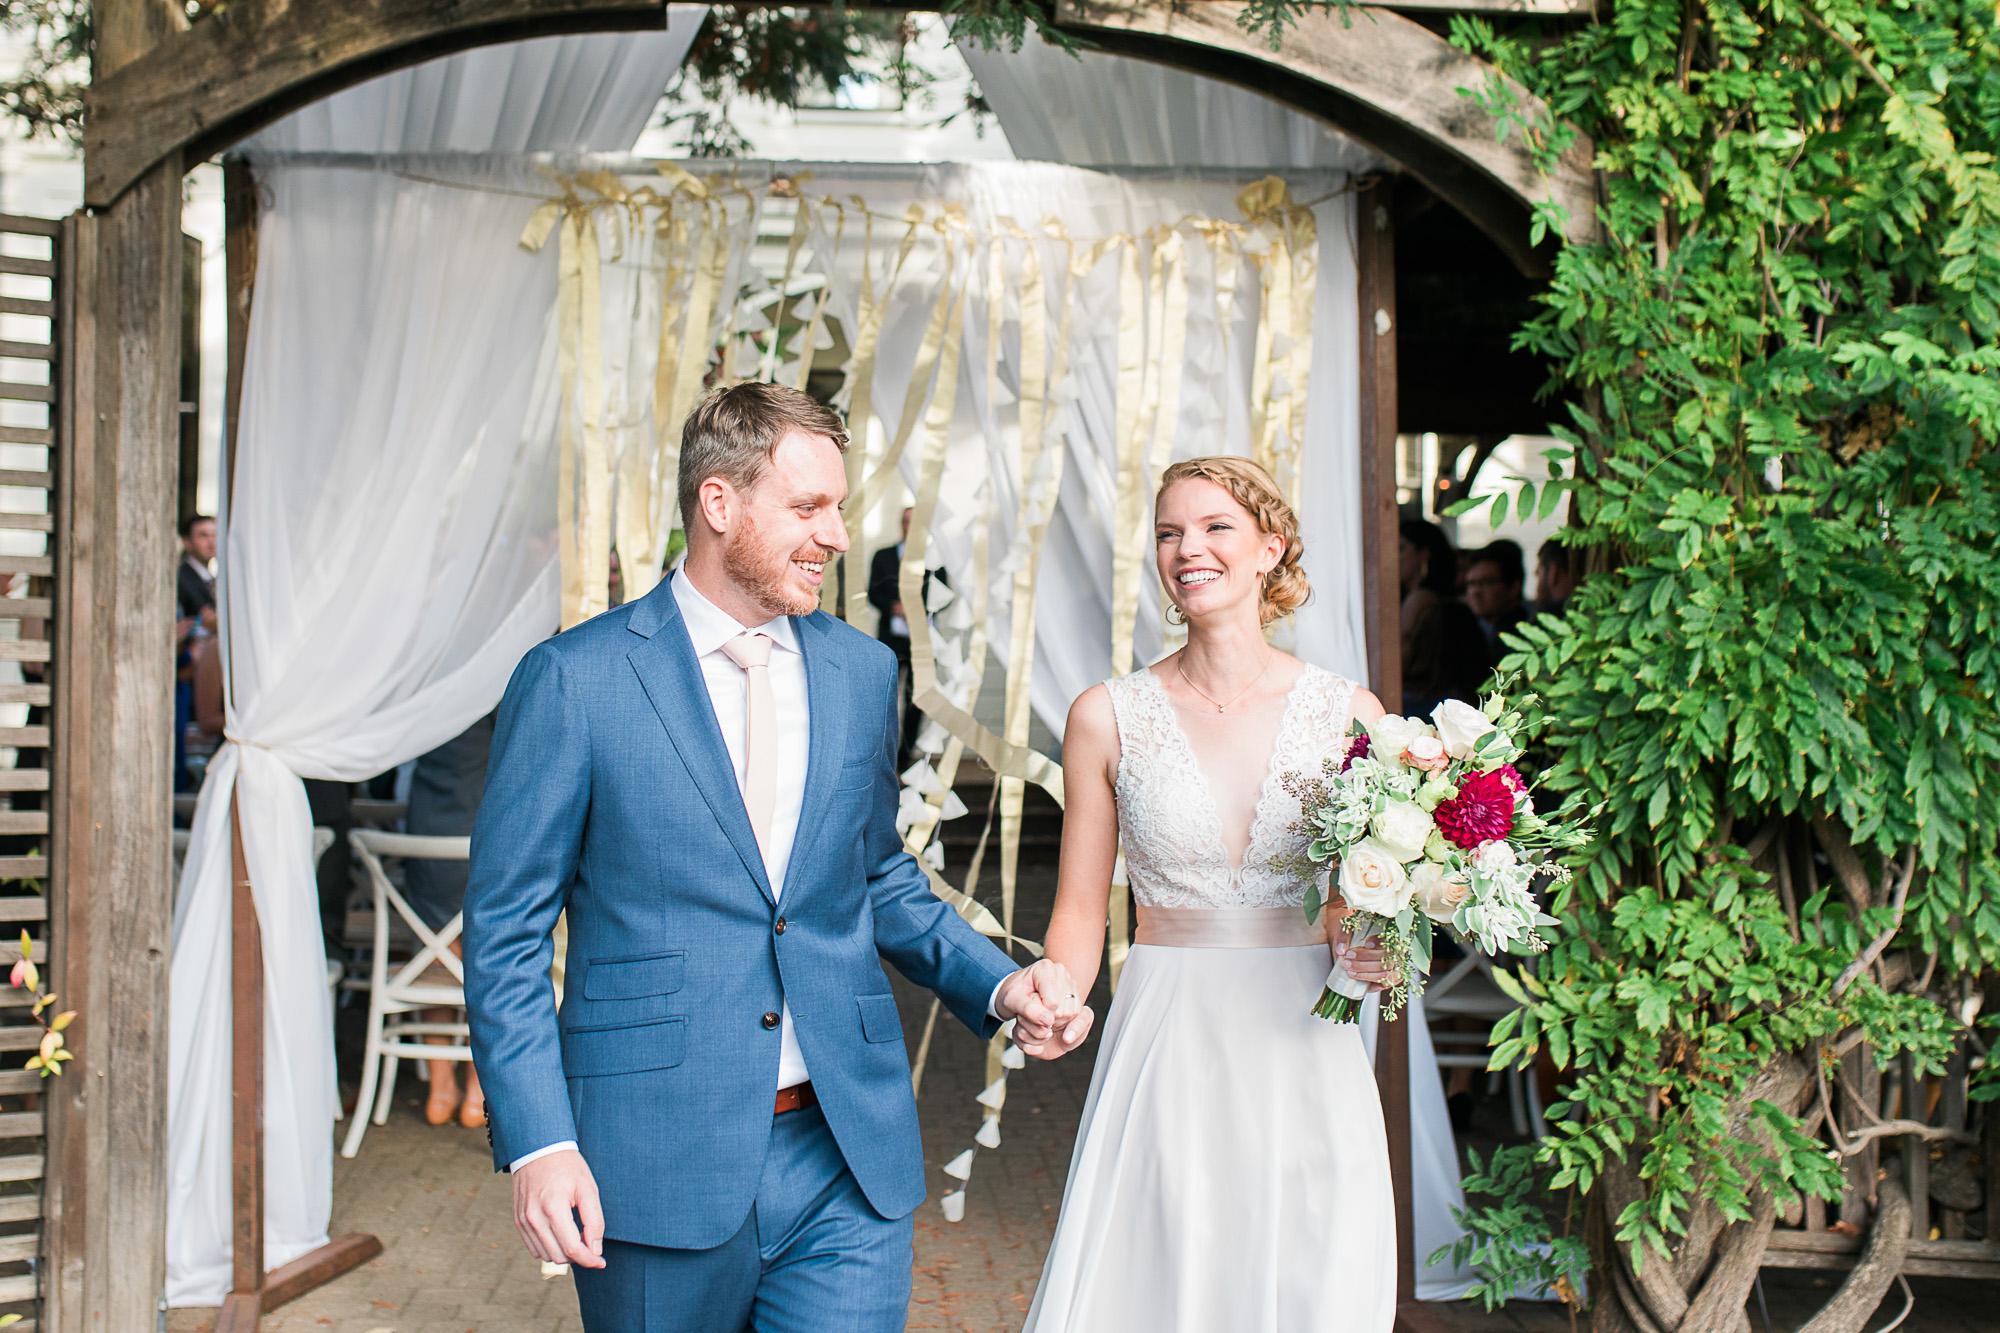 Generals Daughter Wedding Photos by JBJ Pictures - Ramekins Wedding Venue Photographer in Sonoma, Napa (27).jpg